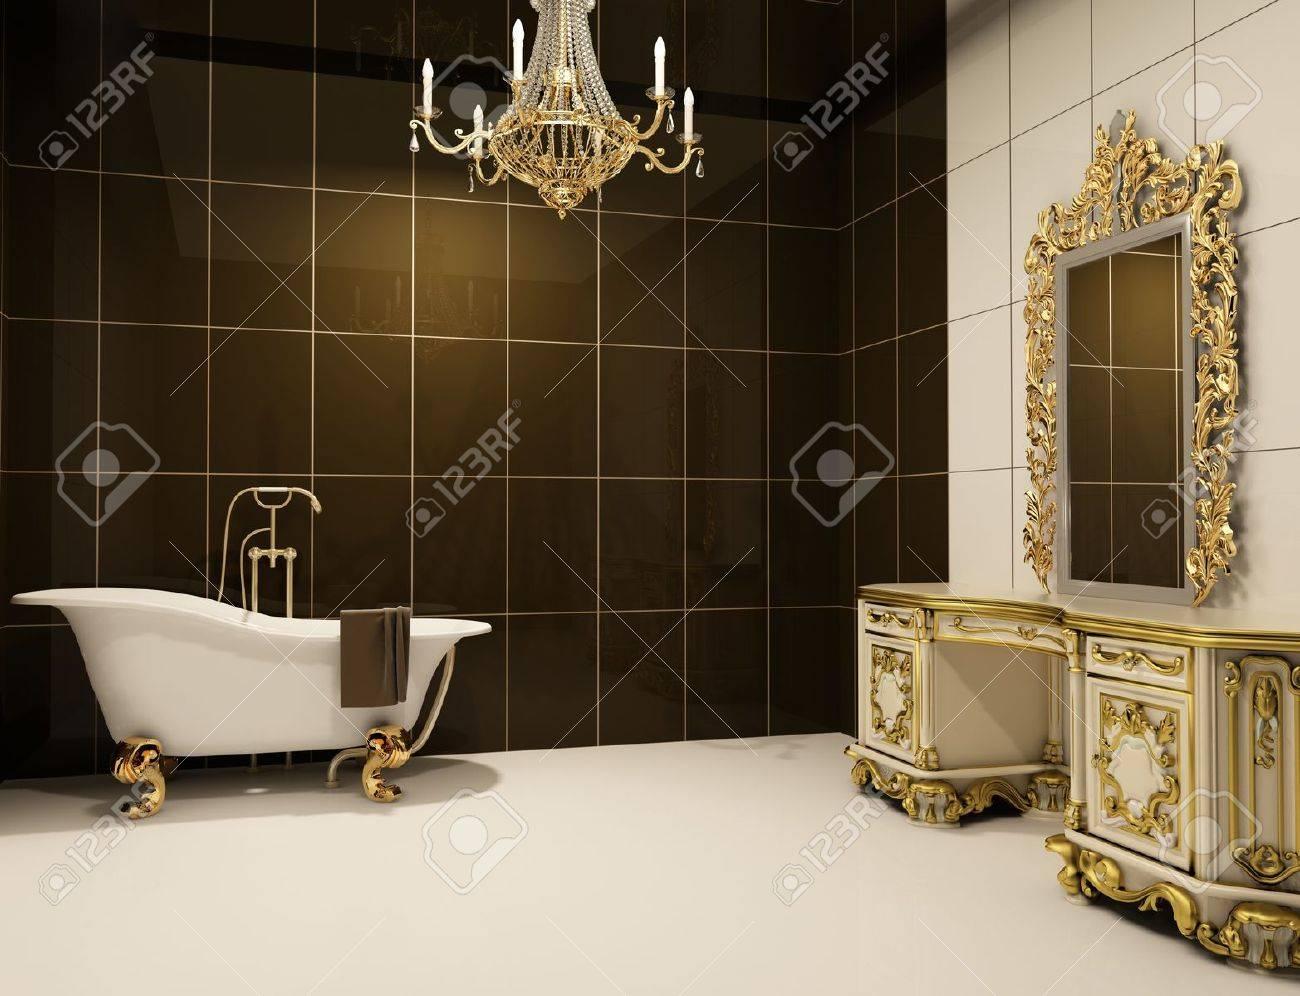 Baroque furniture in bathroom Stock Photo - 10300740